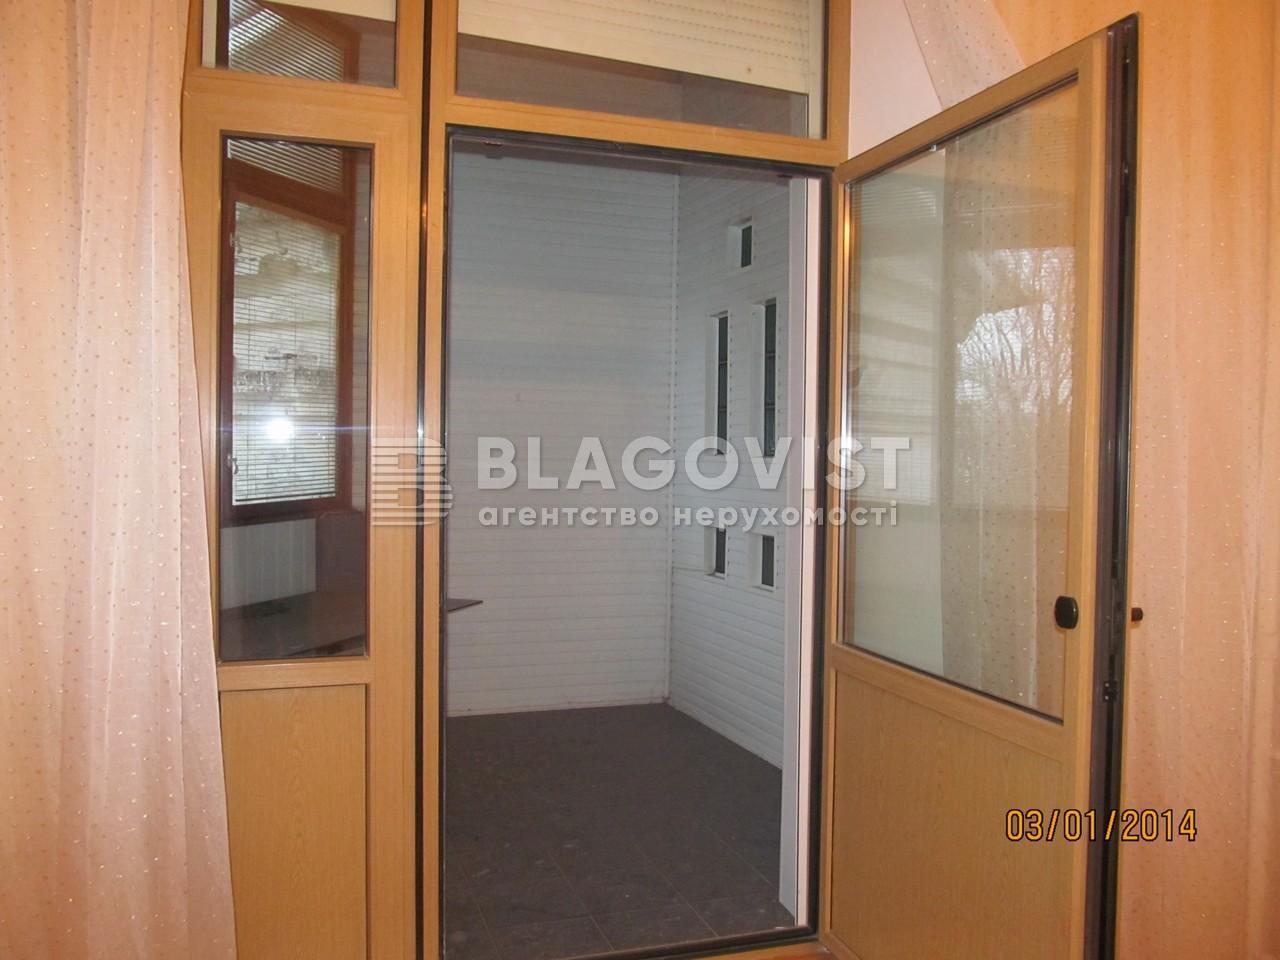 Квартира G-12026, Городецкого Архитектора, 11б, Киев - Фото 19